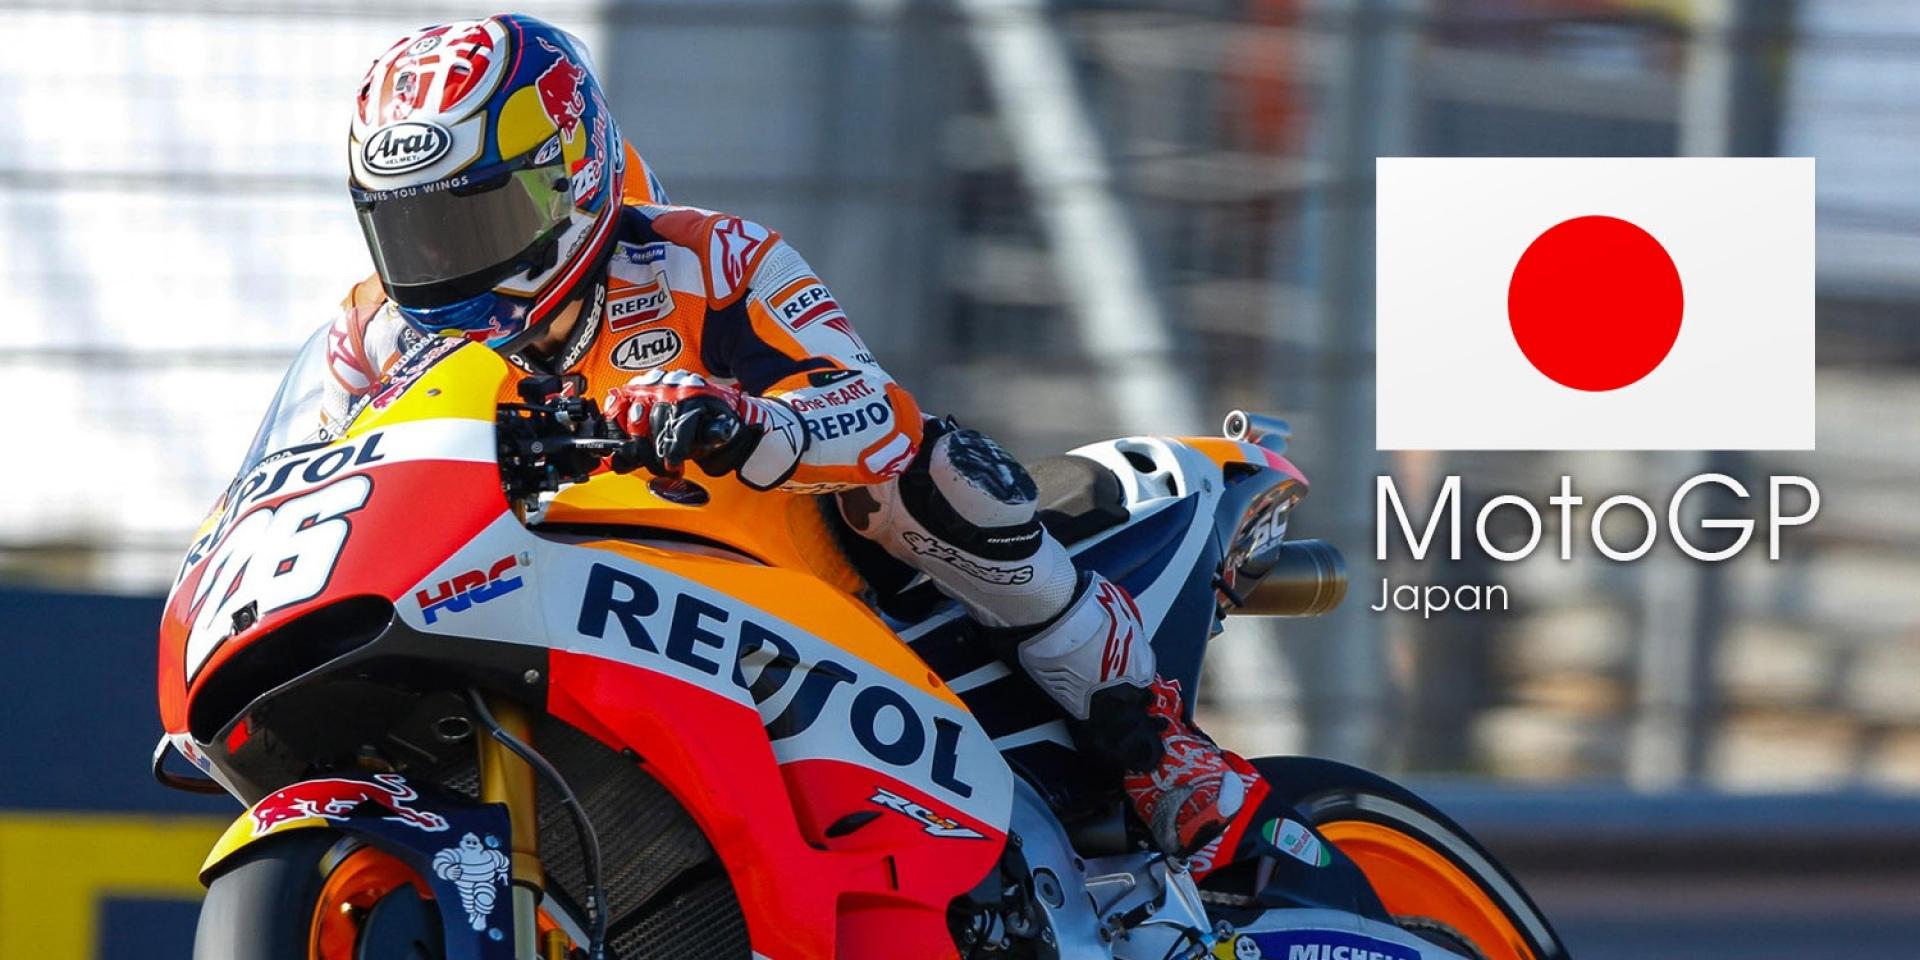 MotoGP 倒數第4站 日本 轉播時間